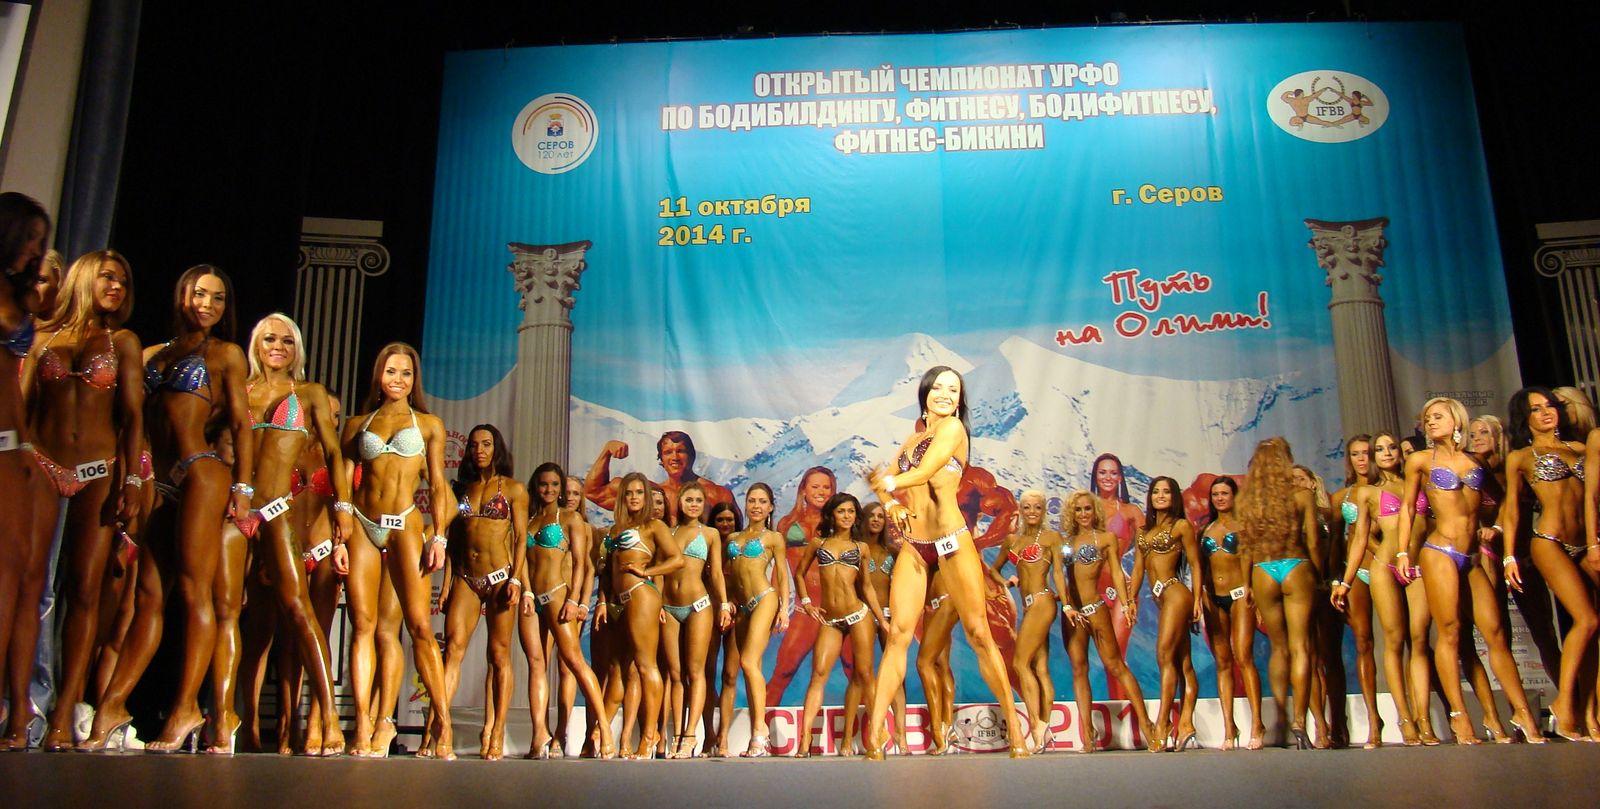 Фитнес-бикини до 163 см, 44 участницы